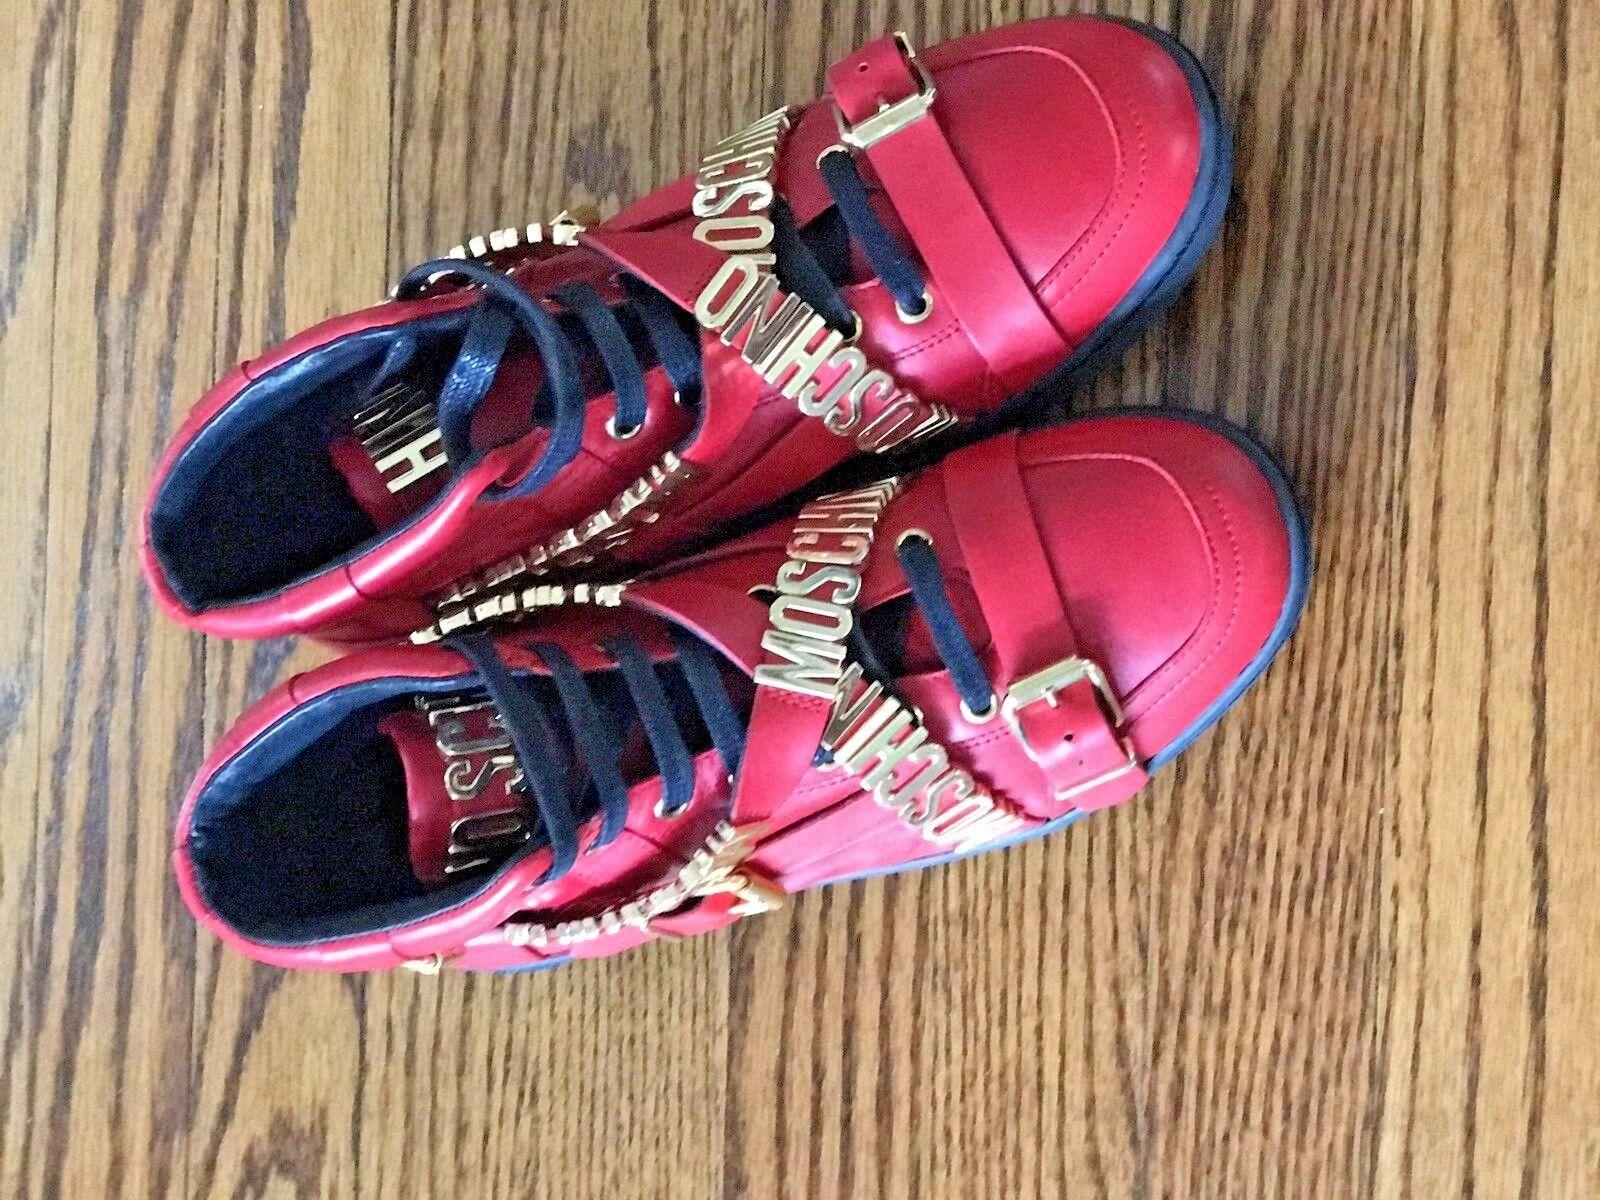 Scarpe casual da uomo  Moschino Red Strap Logo High-Top Leather Sneakers 9.5 NWT